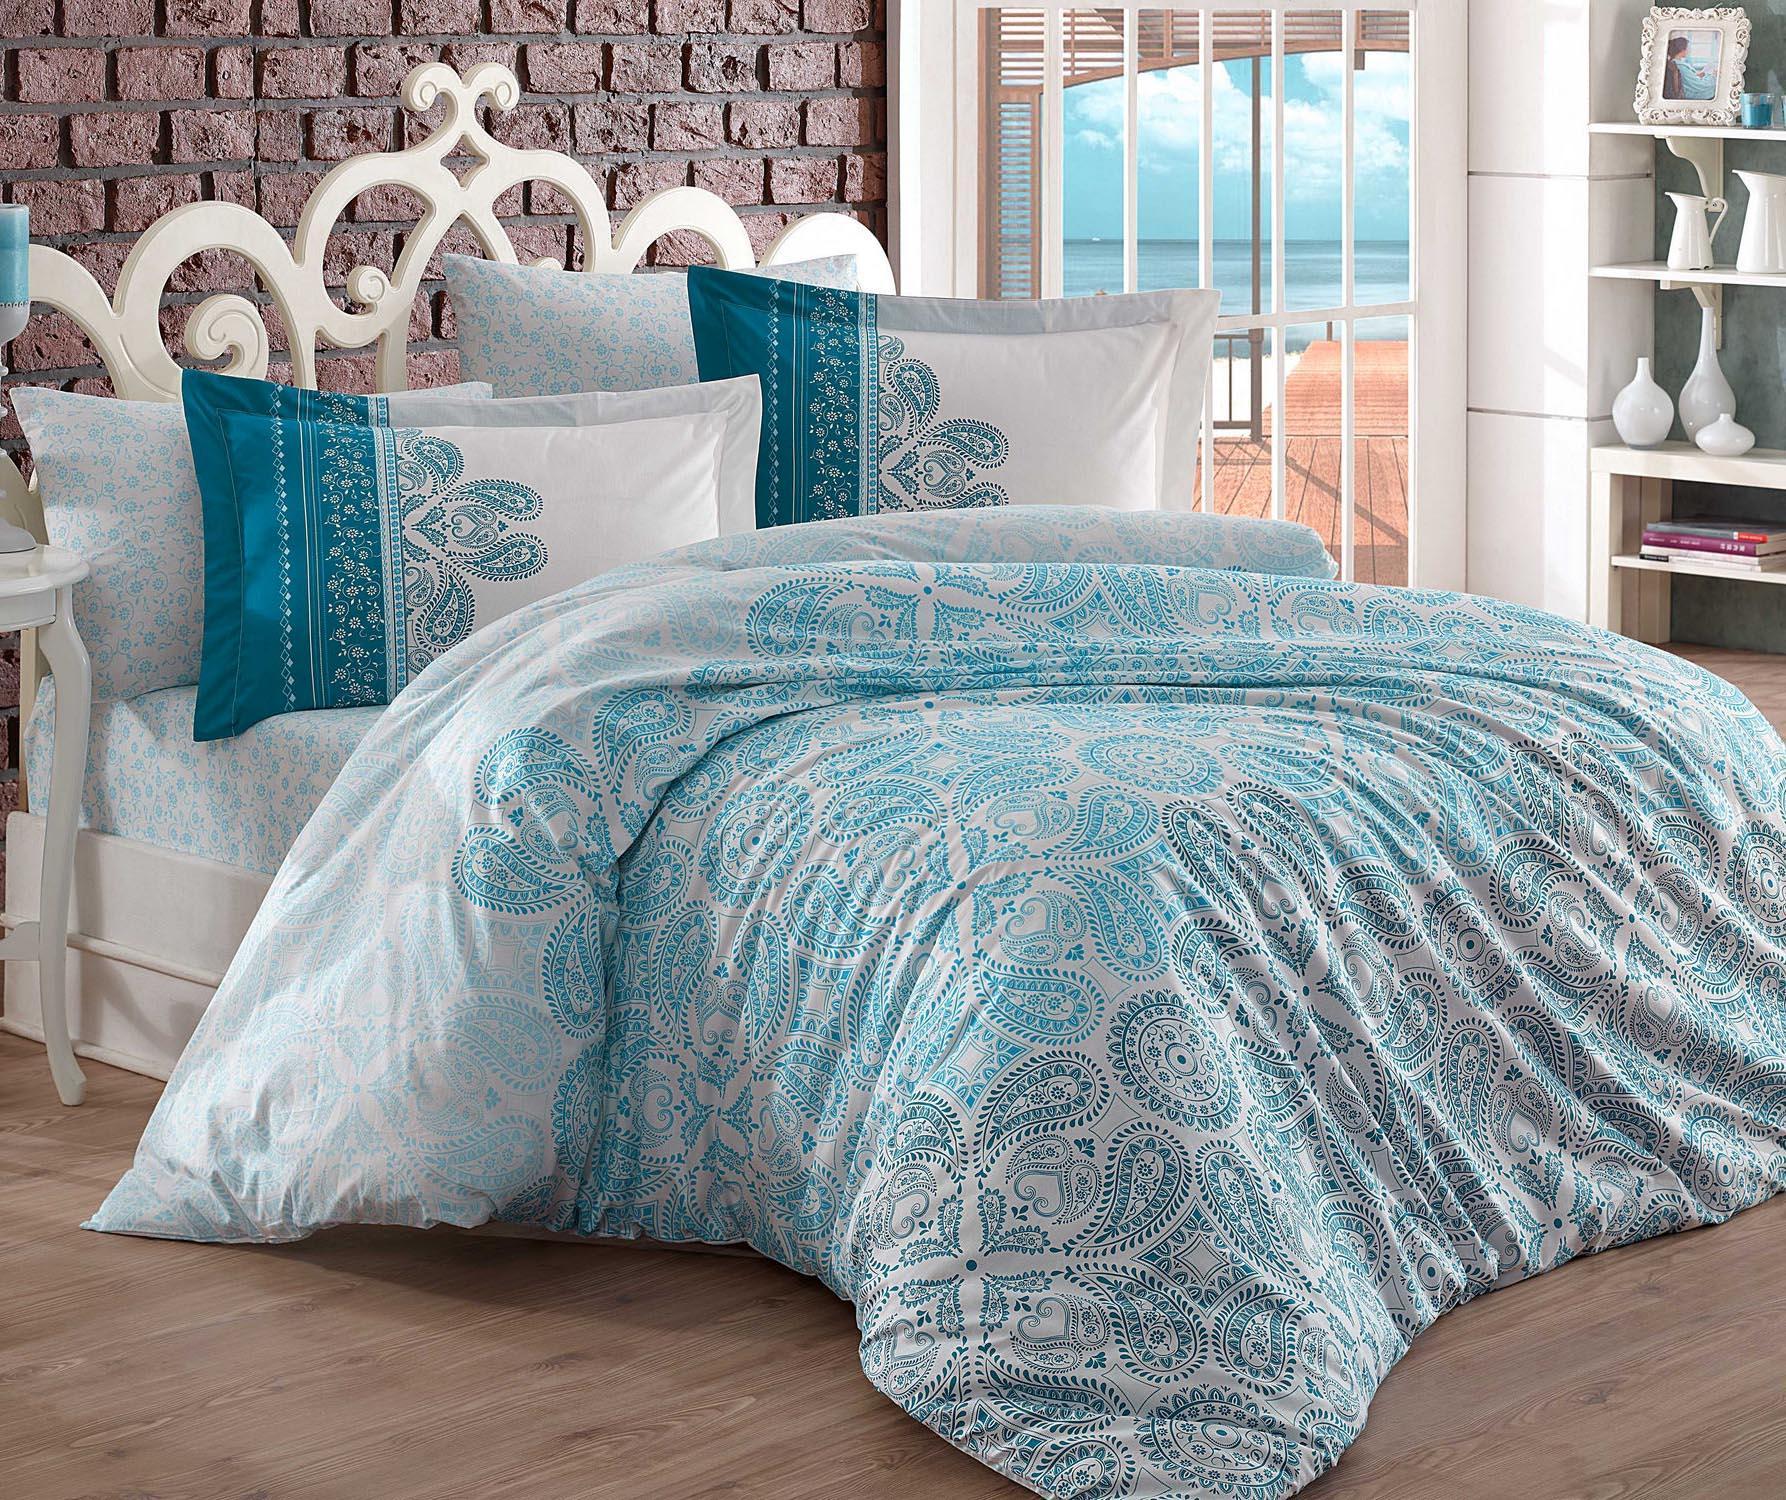 Lenjerie de pat King Poplin Irene Turquoise 200x220 - Hobby, Albastru de la Hobby